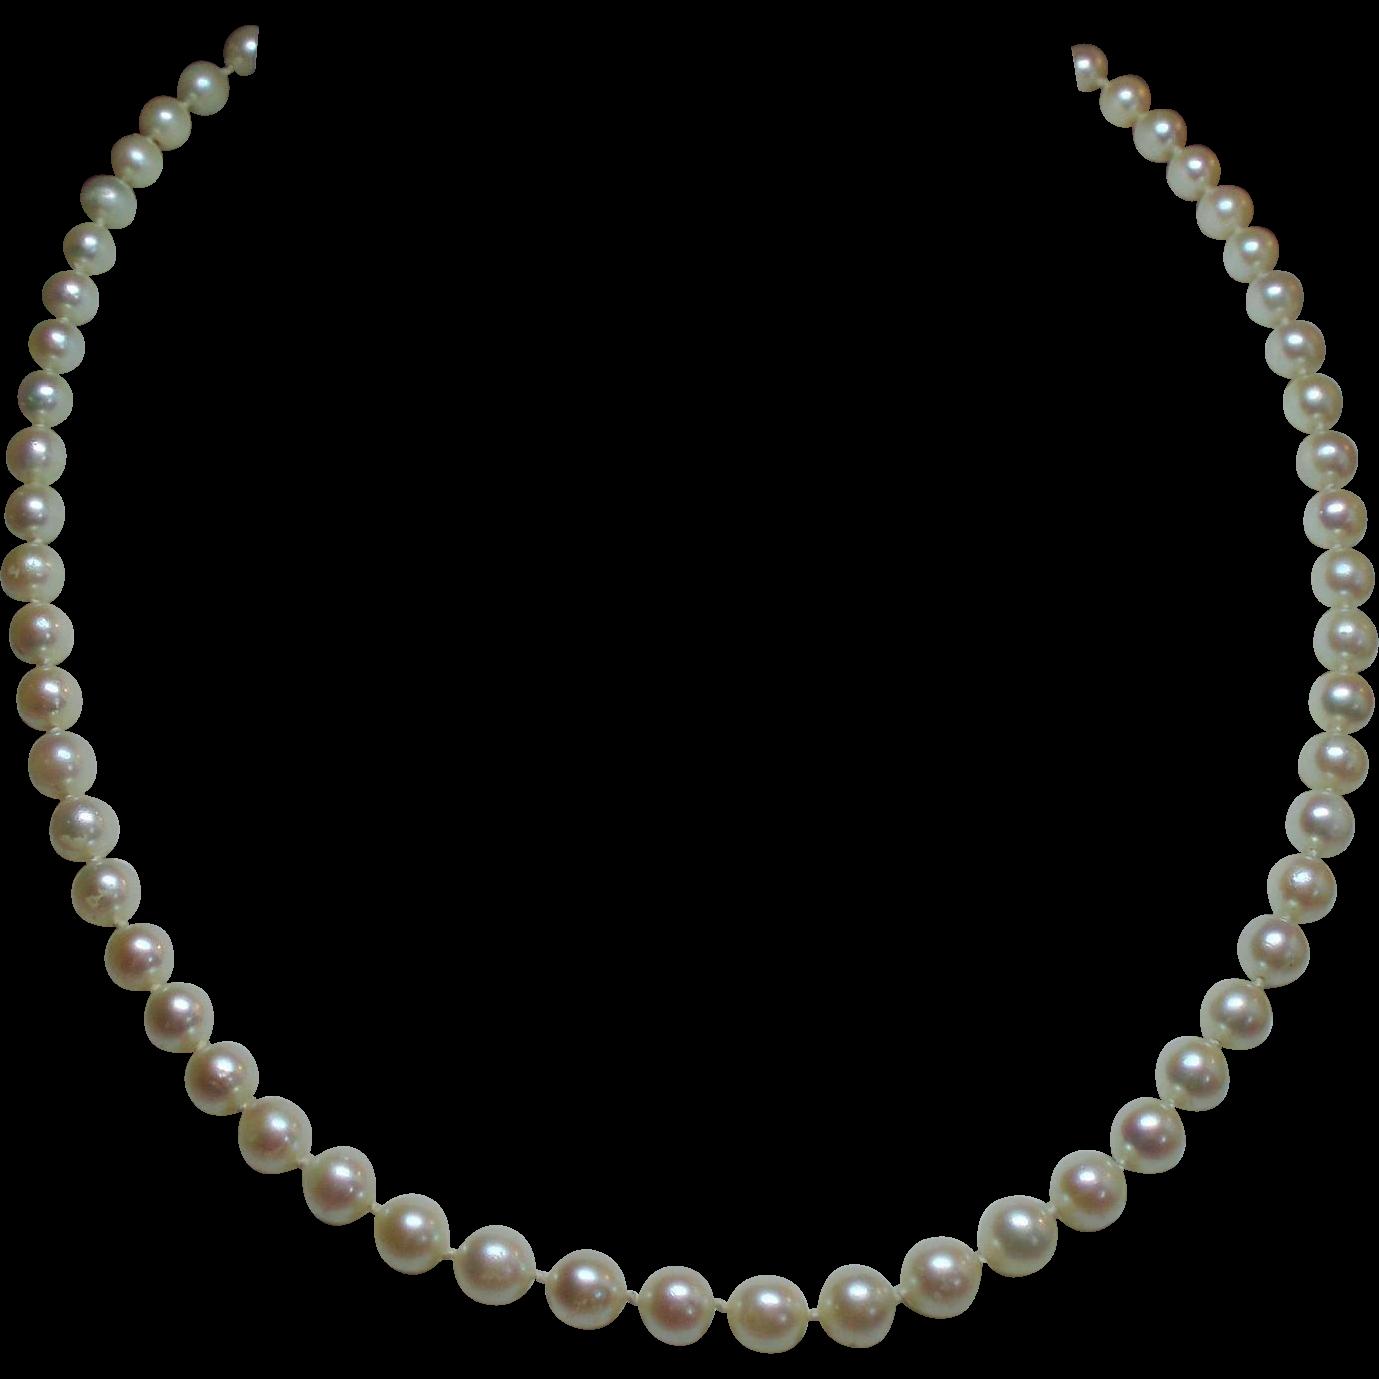 Vintage 6 Millimeter Cultured Pearl Princess Length Strand Necklace 14KWG Filigree Clasp